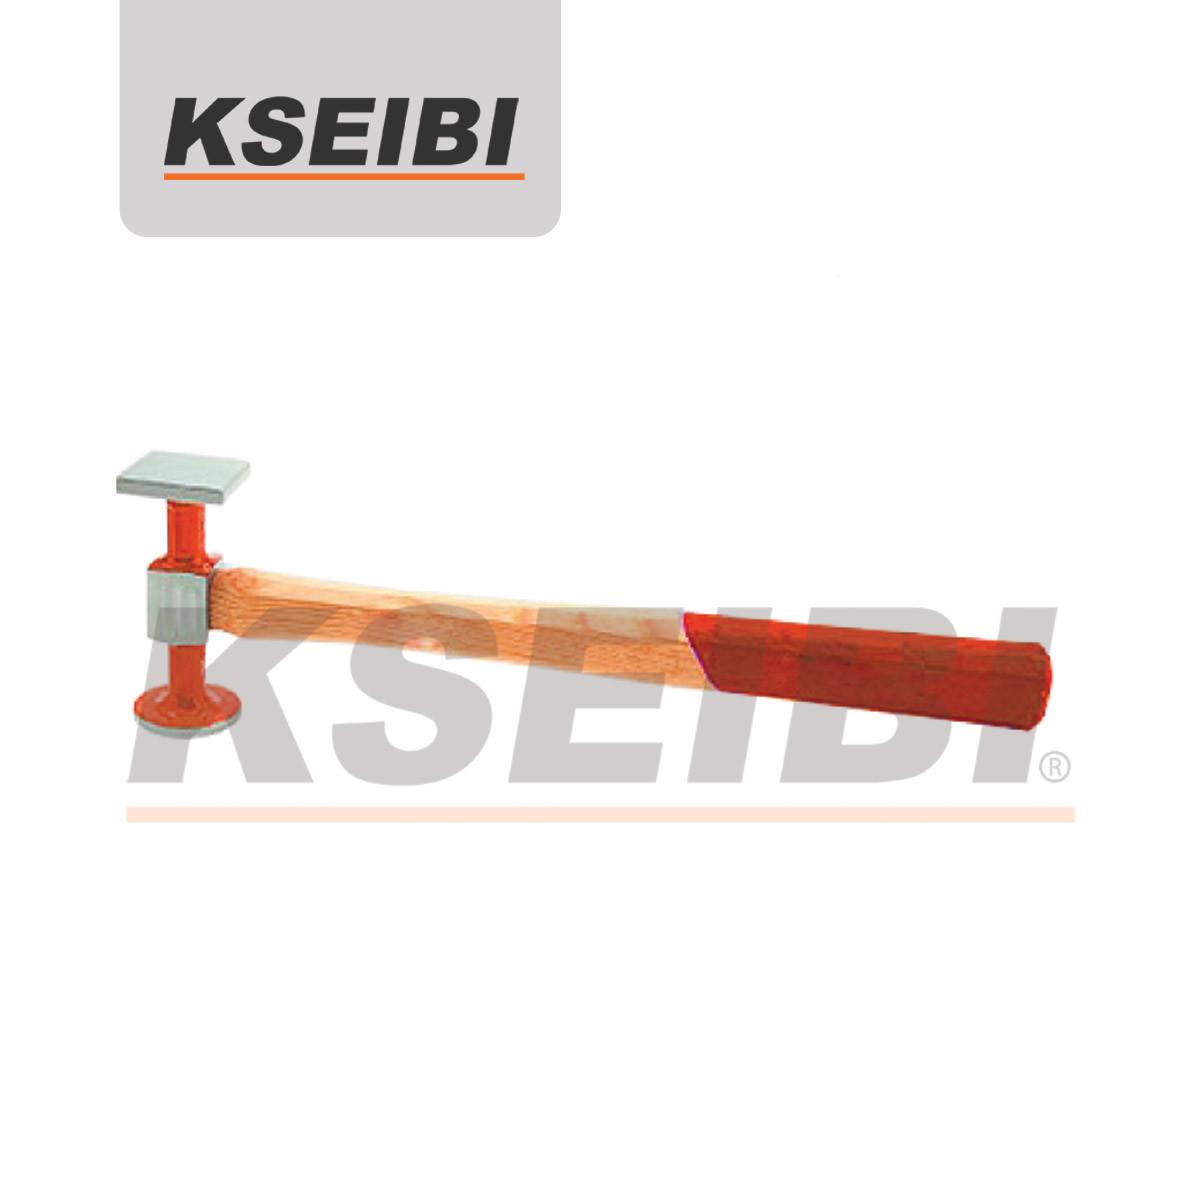 Kseibi Unique Design Standard Bumping Hammer